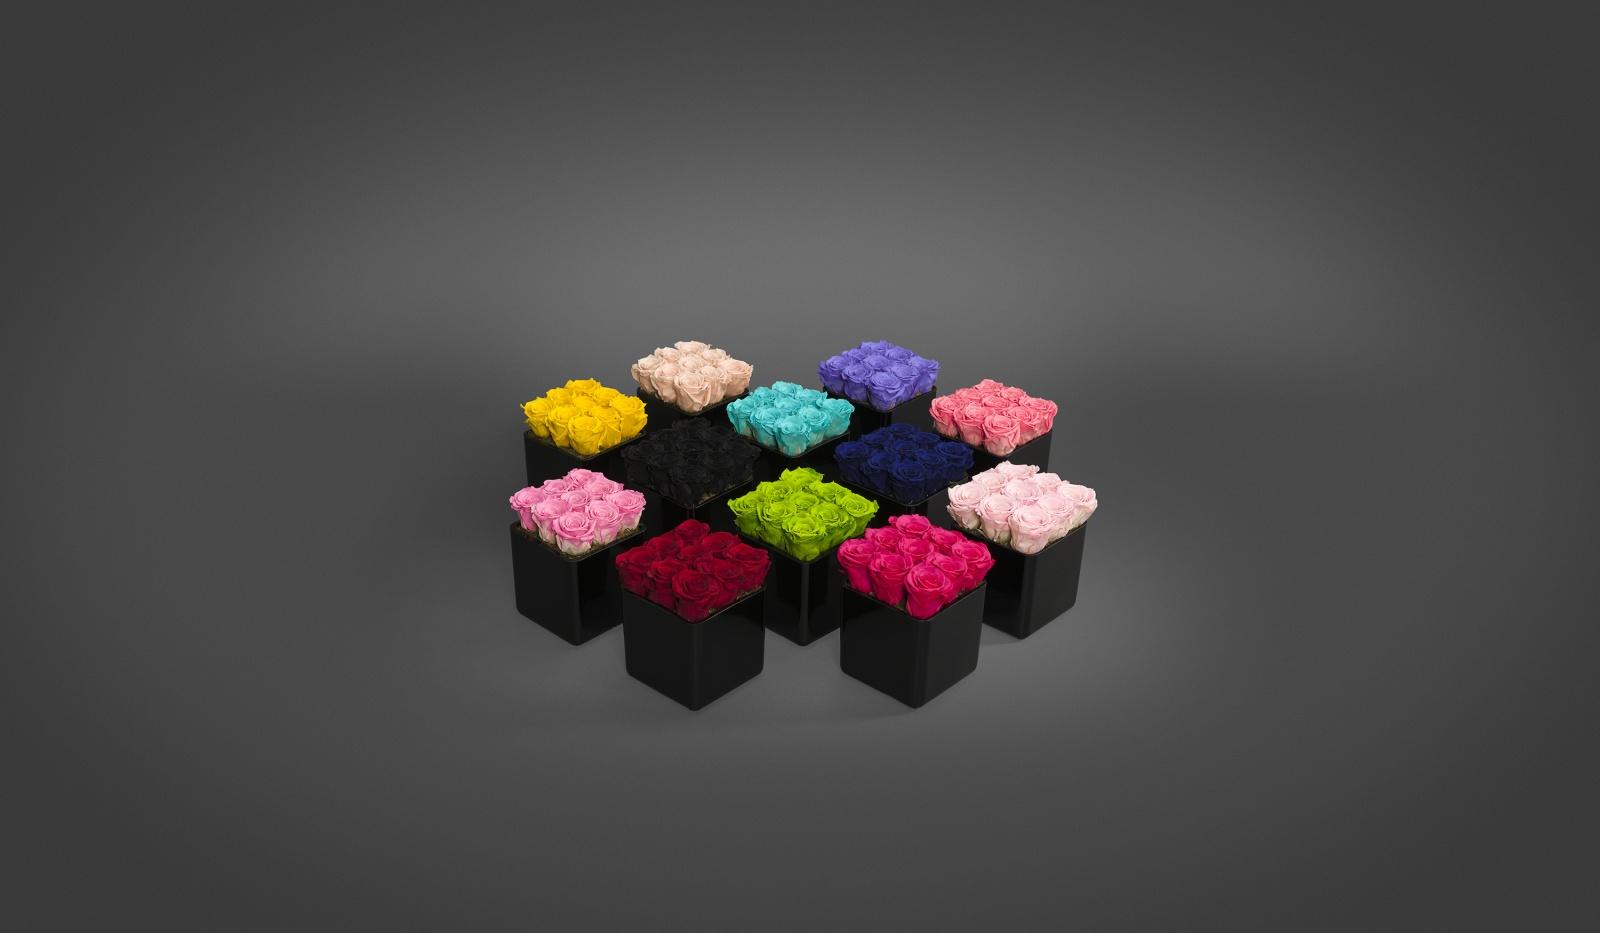 The InfiniteRose Cube